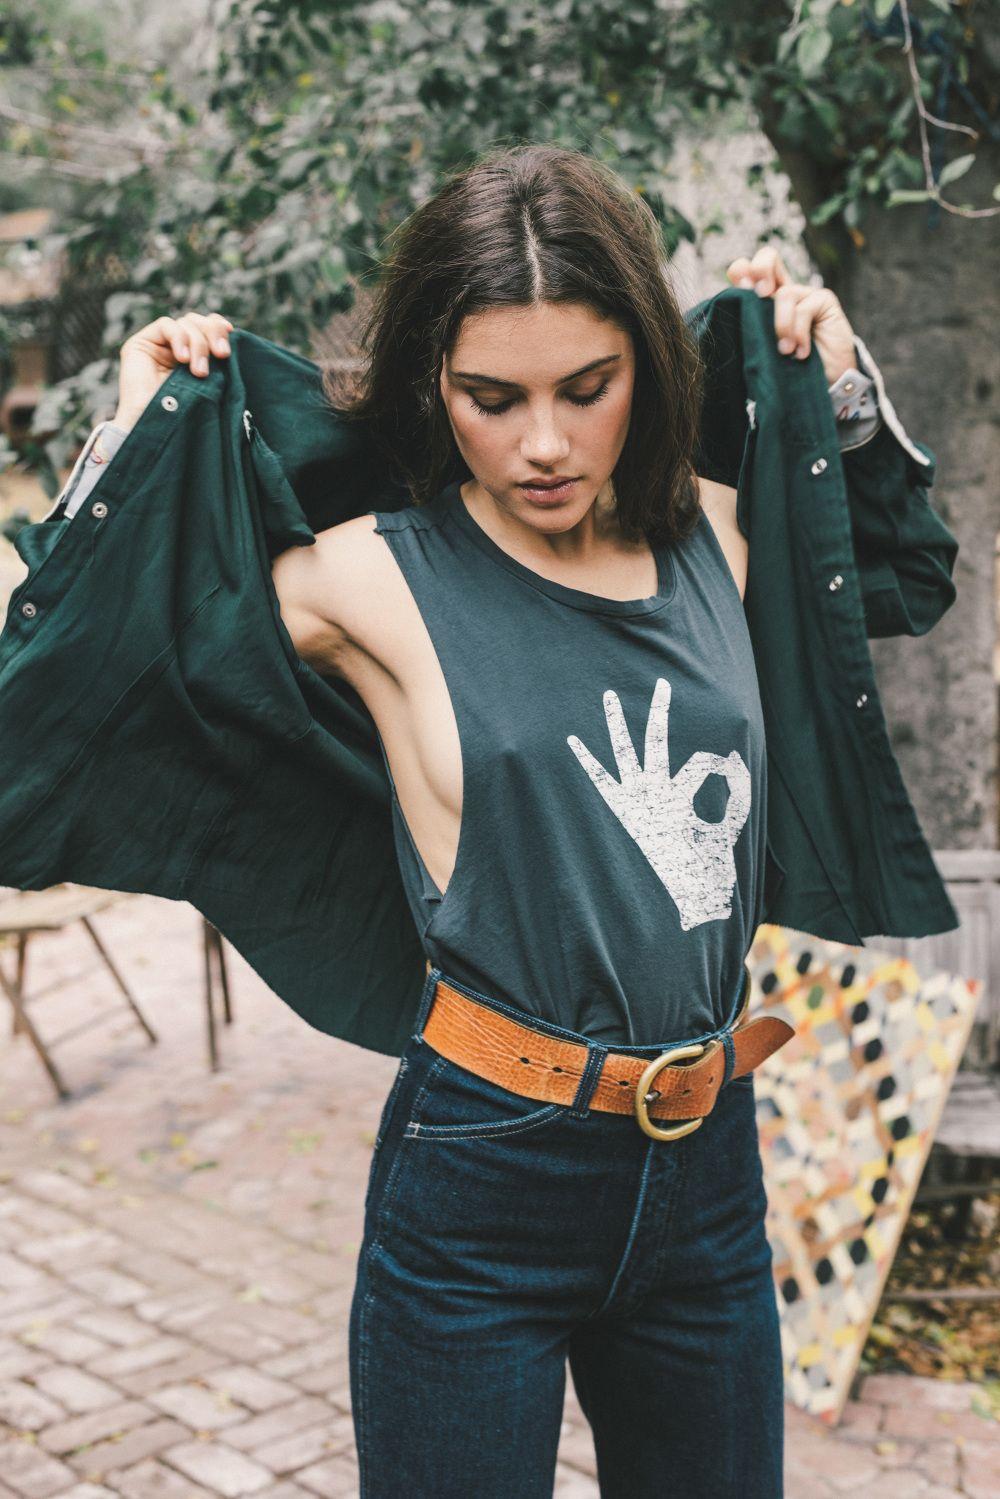 Harte Nippel Unter Deinem T Shirt Outfit In 2018 Pinterest Sonne Anne Sf8008 Camel Premium Lady Comfort Casual Leather Sandal